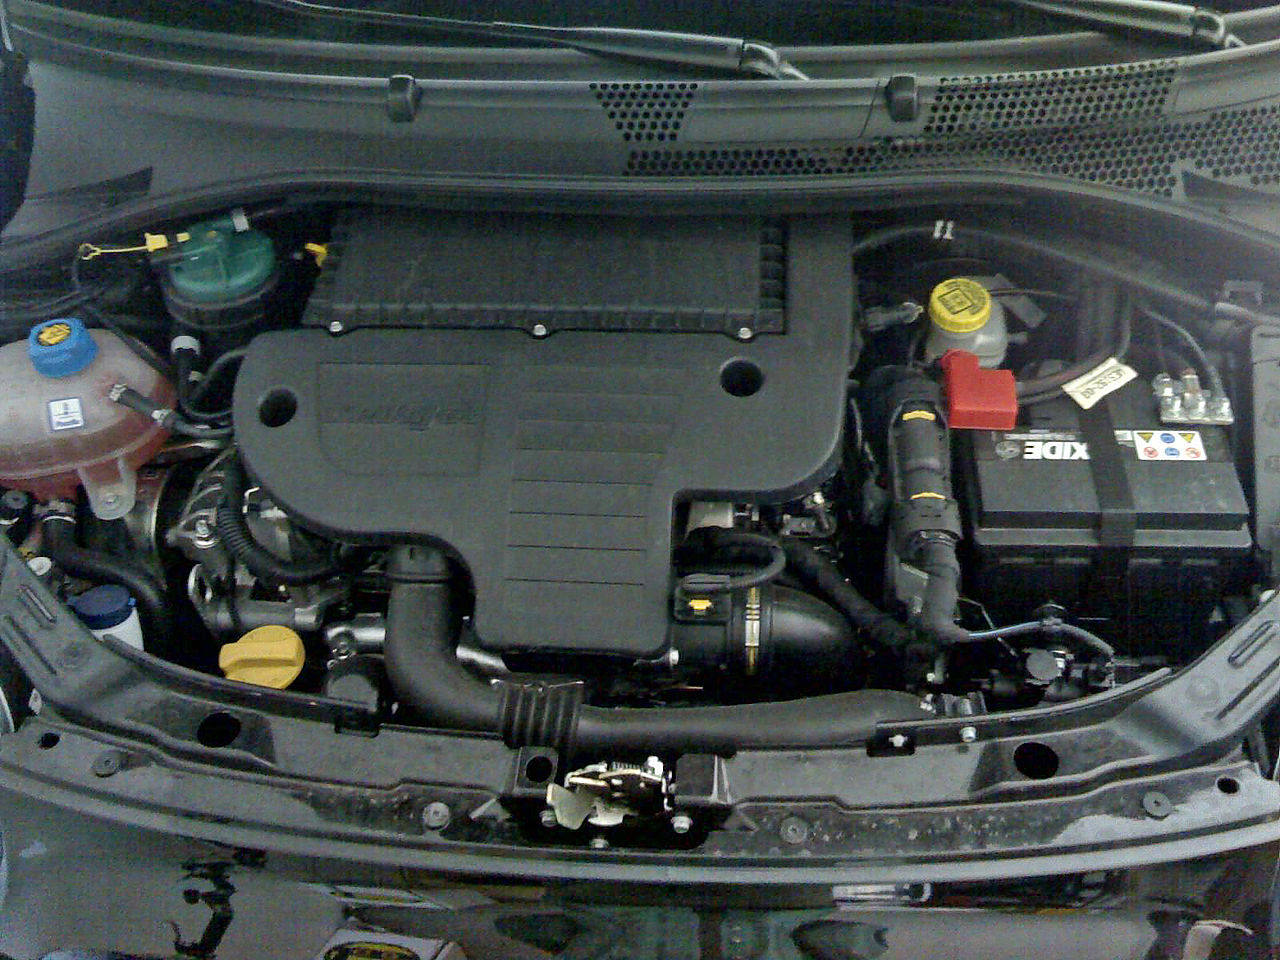 hight resolution of 2013 fiat 500 engine diagram fiat 500 tuning wiring 2012 polaris ranger 500 wiring diagram 2012 polaris ranger ev wiring diagram